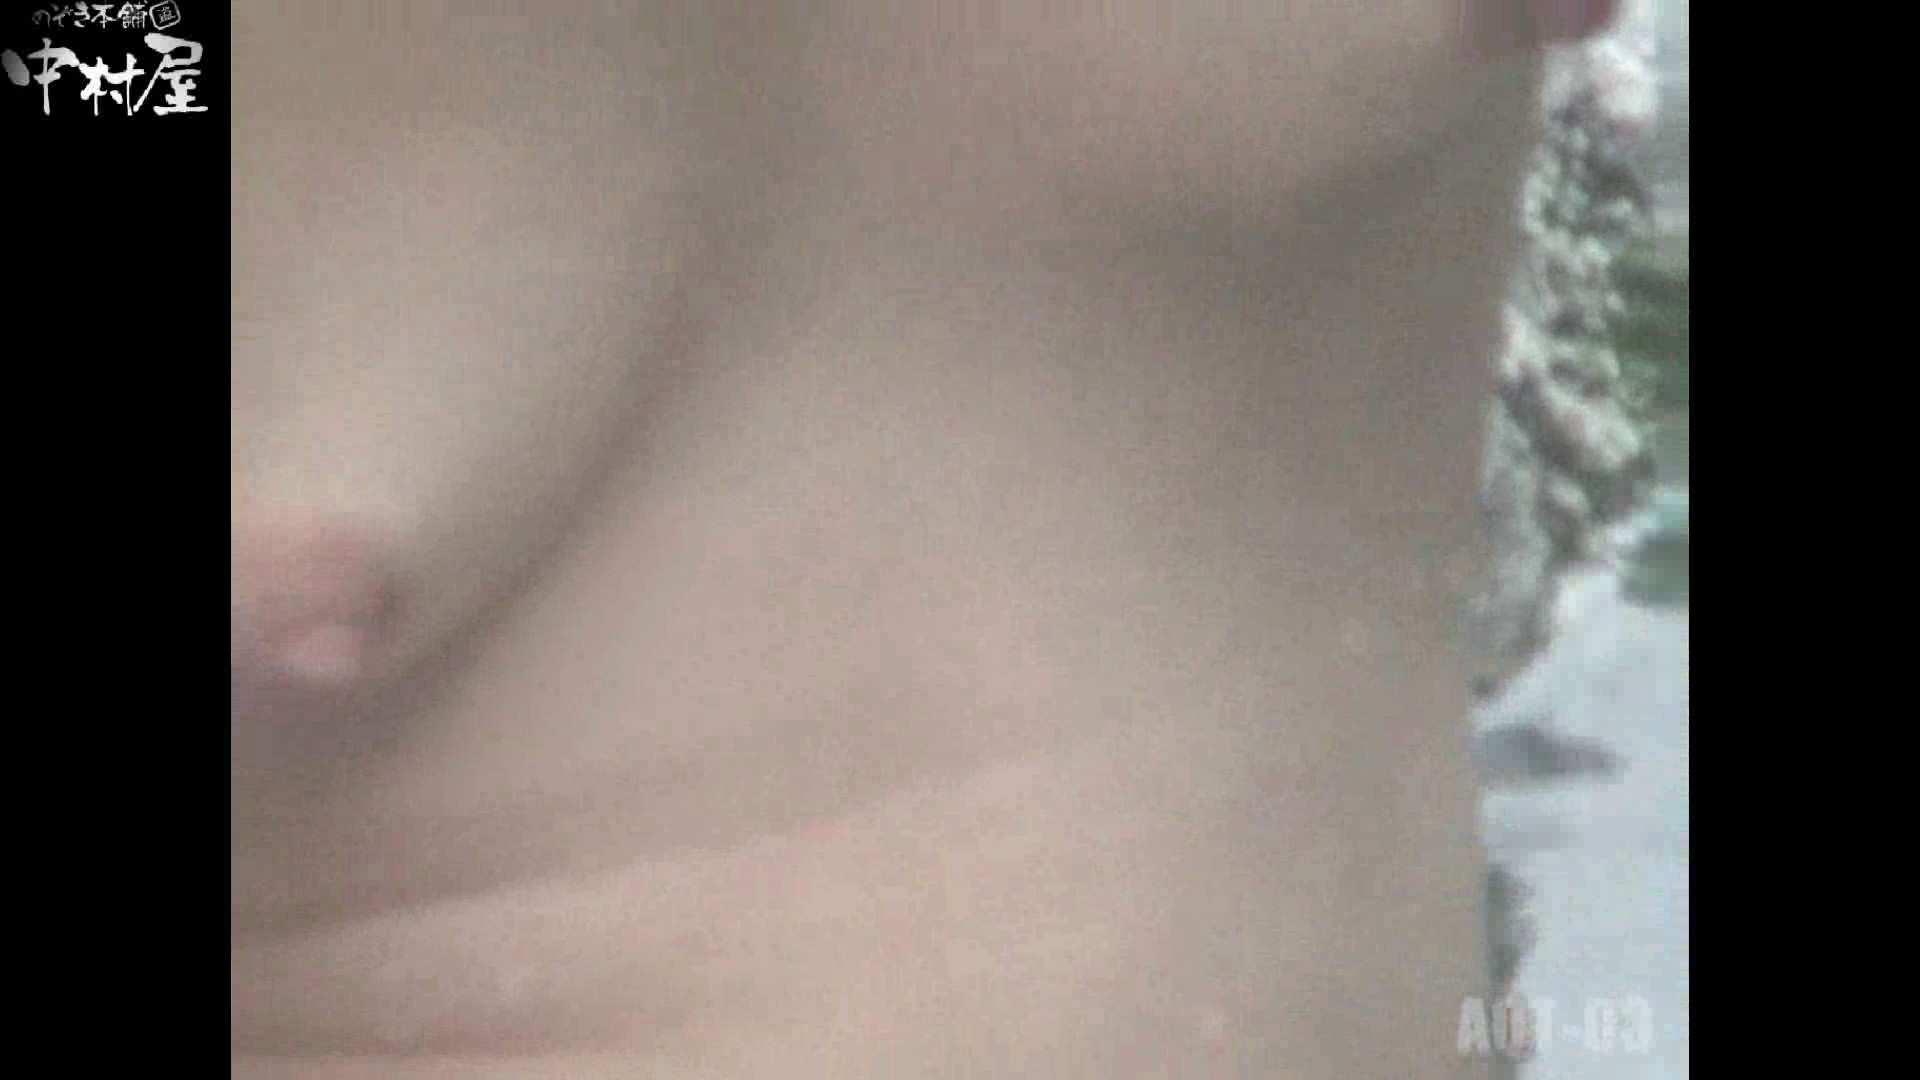 Aquaな露天風呂Vol.867潜入盗撮露天風呂参判湯 其の一 盗撮 | 潜入シリーズ  88pic 27